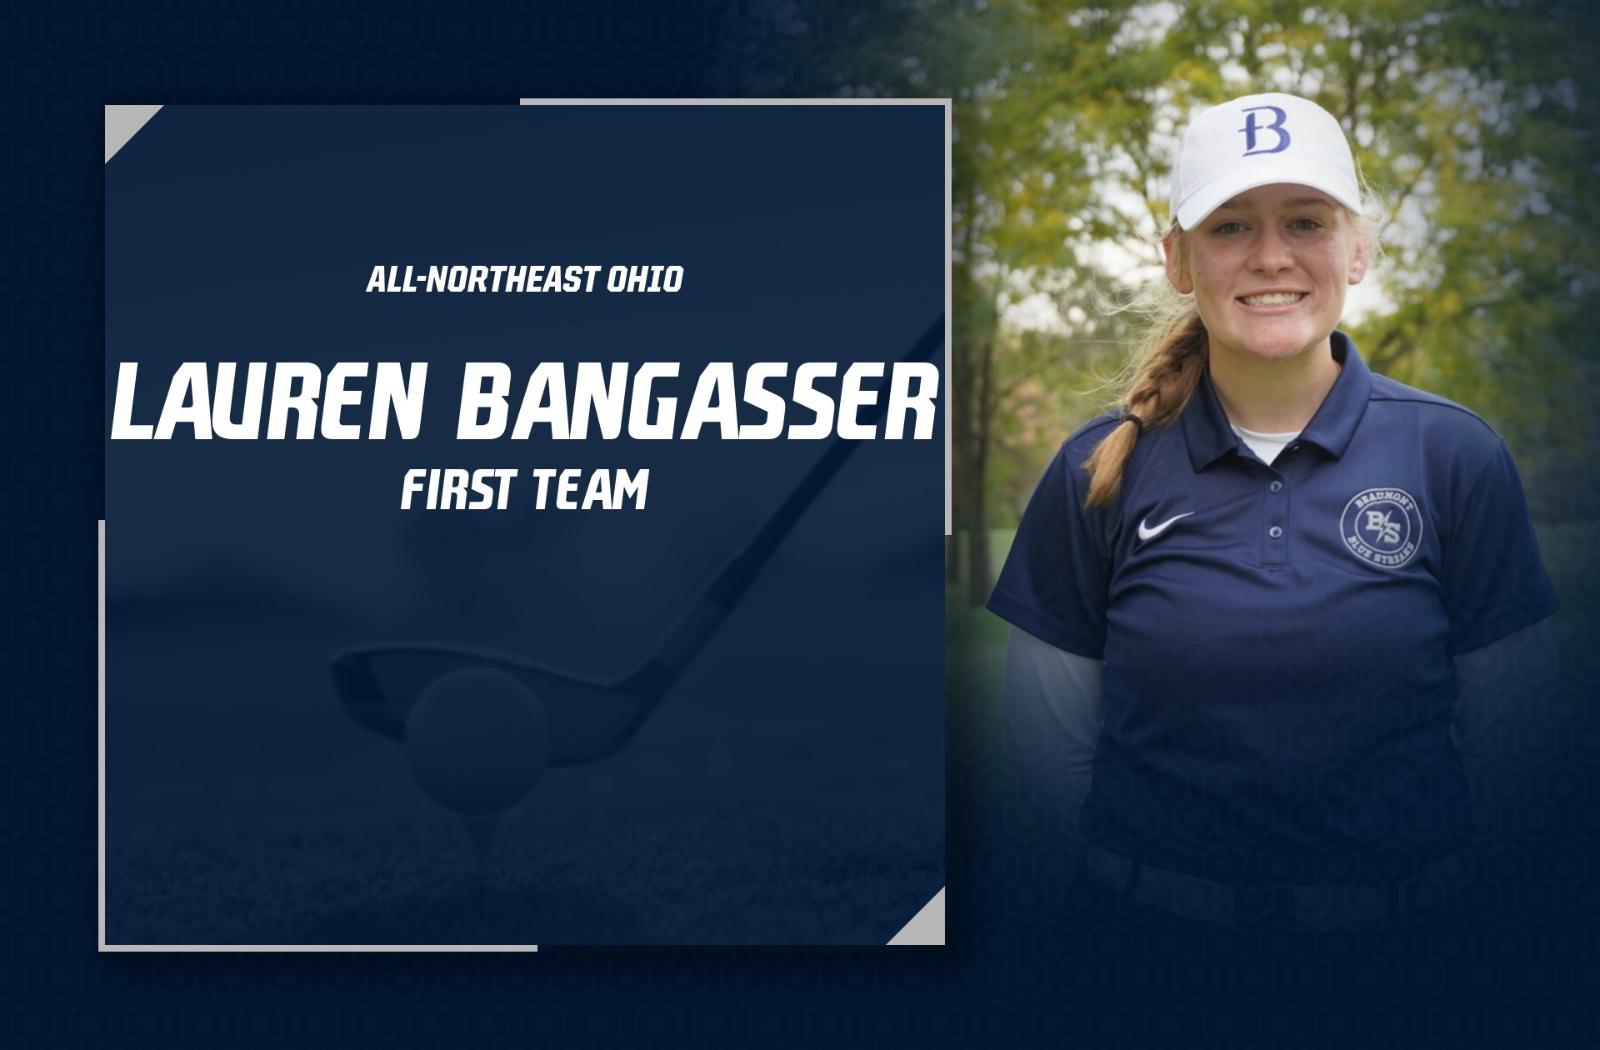 Lauren Bangasser Named First Team All-Northeast Ohio